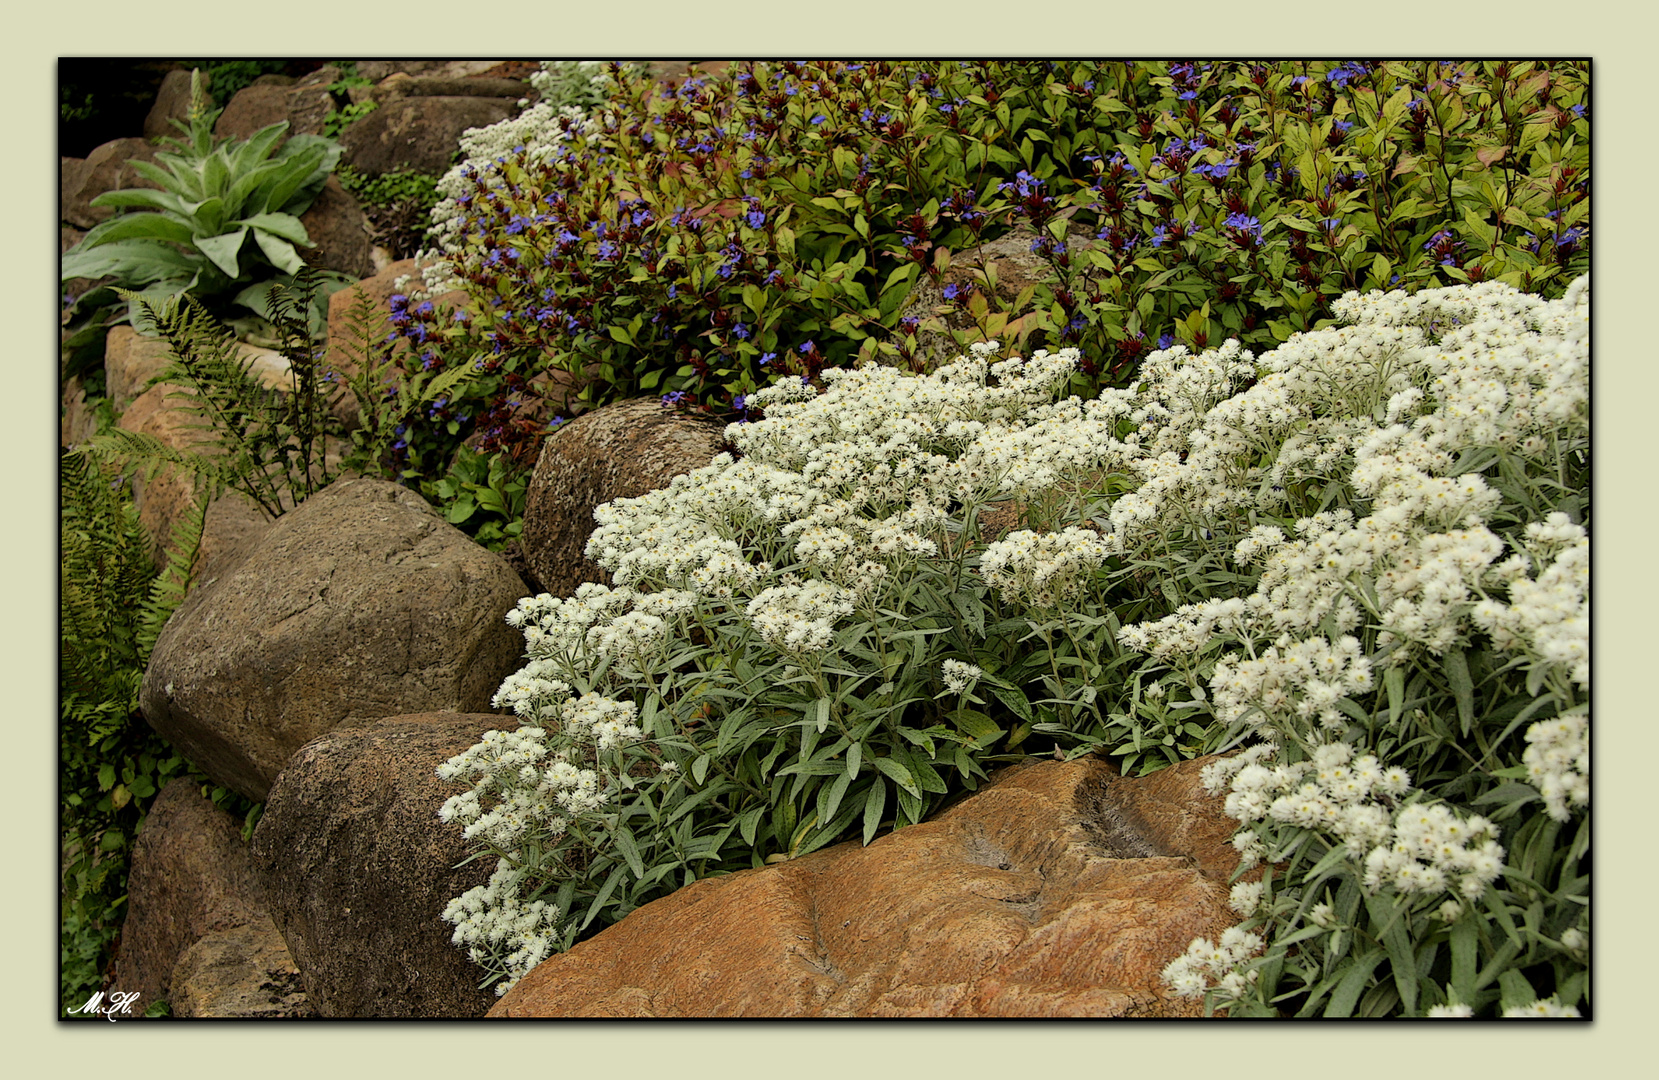 steingartenpflanzen foto bild pflanzen pilze flechten bl ten kleinpflanzen. Black Bedroom Furniture Sets. Home Design Ideas